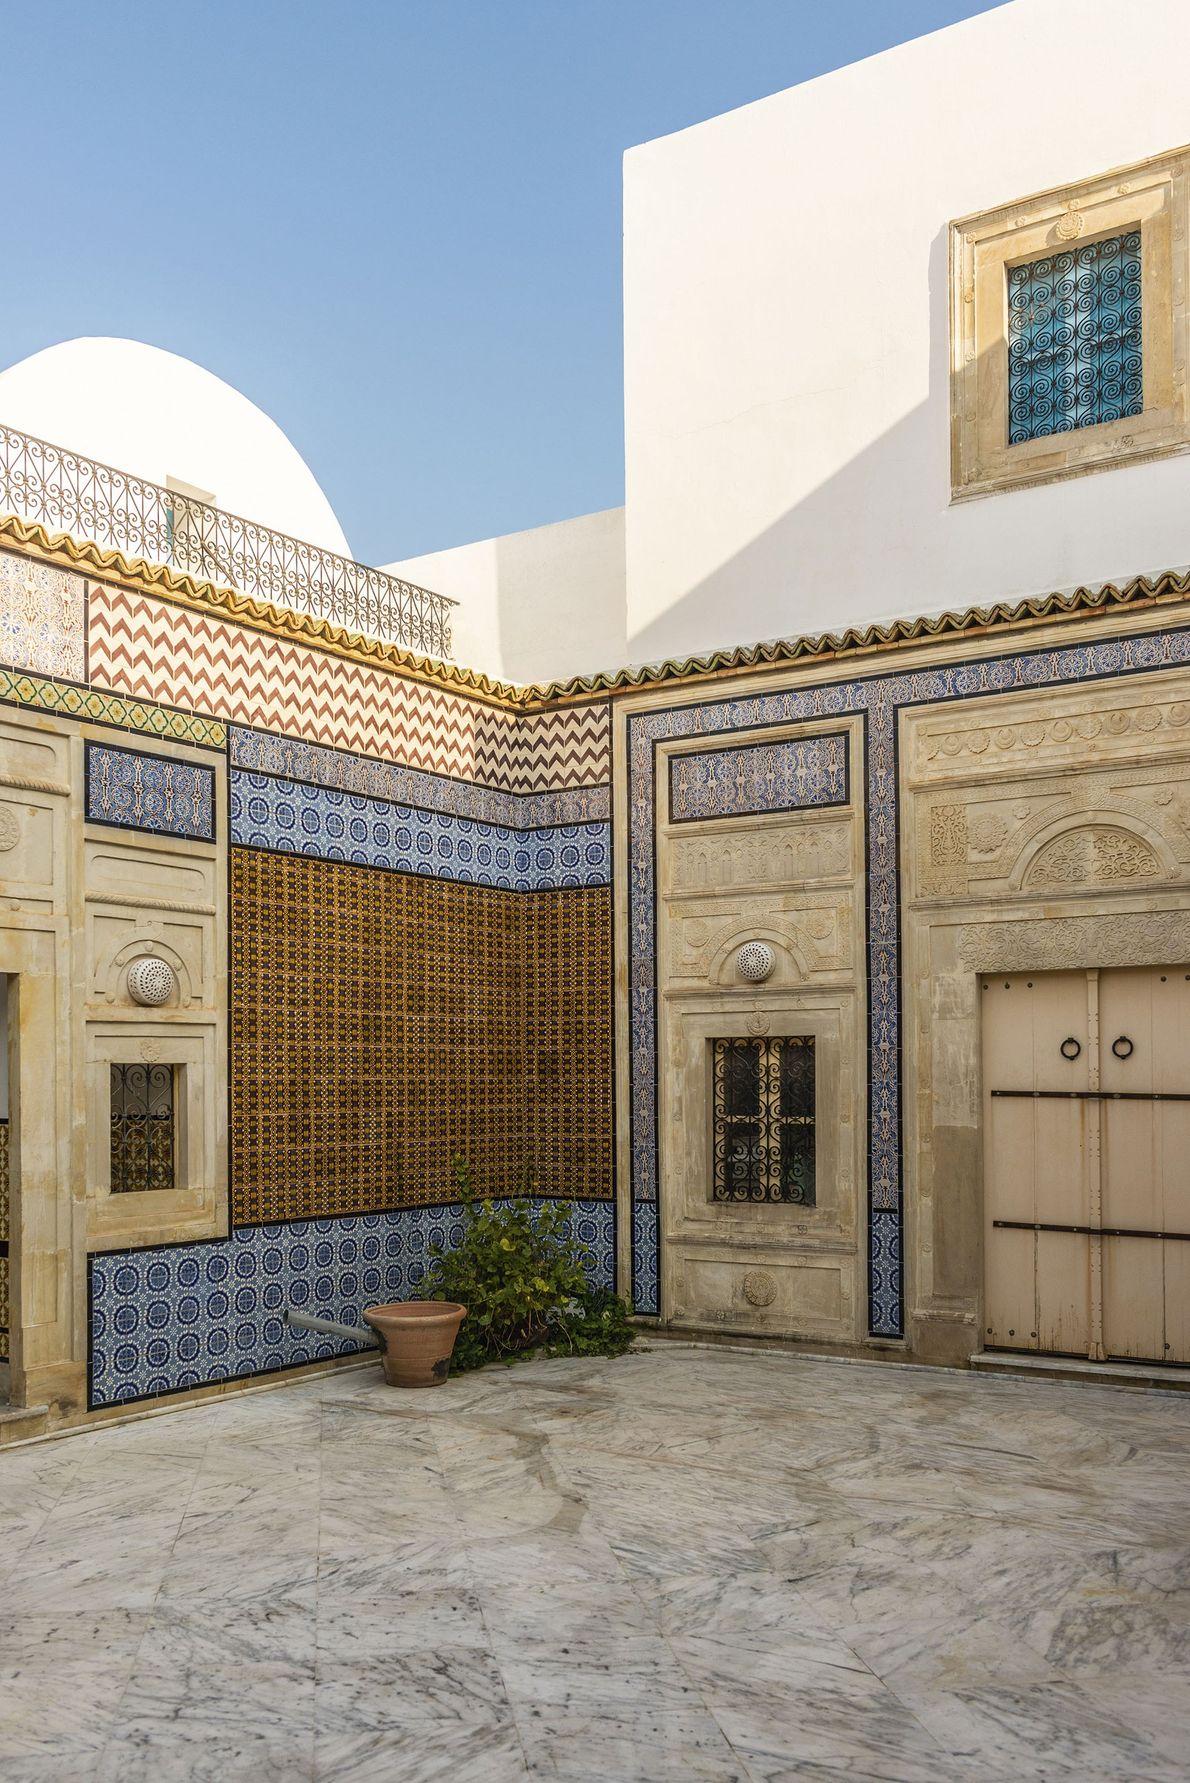 Courtyard at Rafik's home.